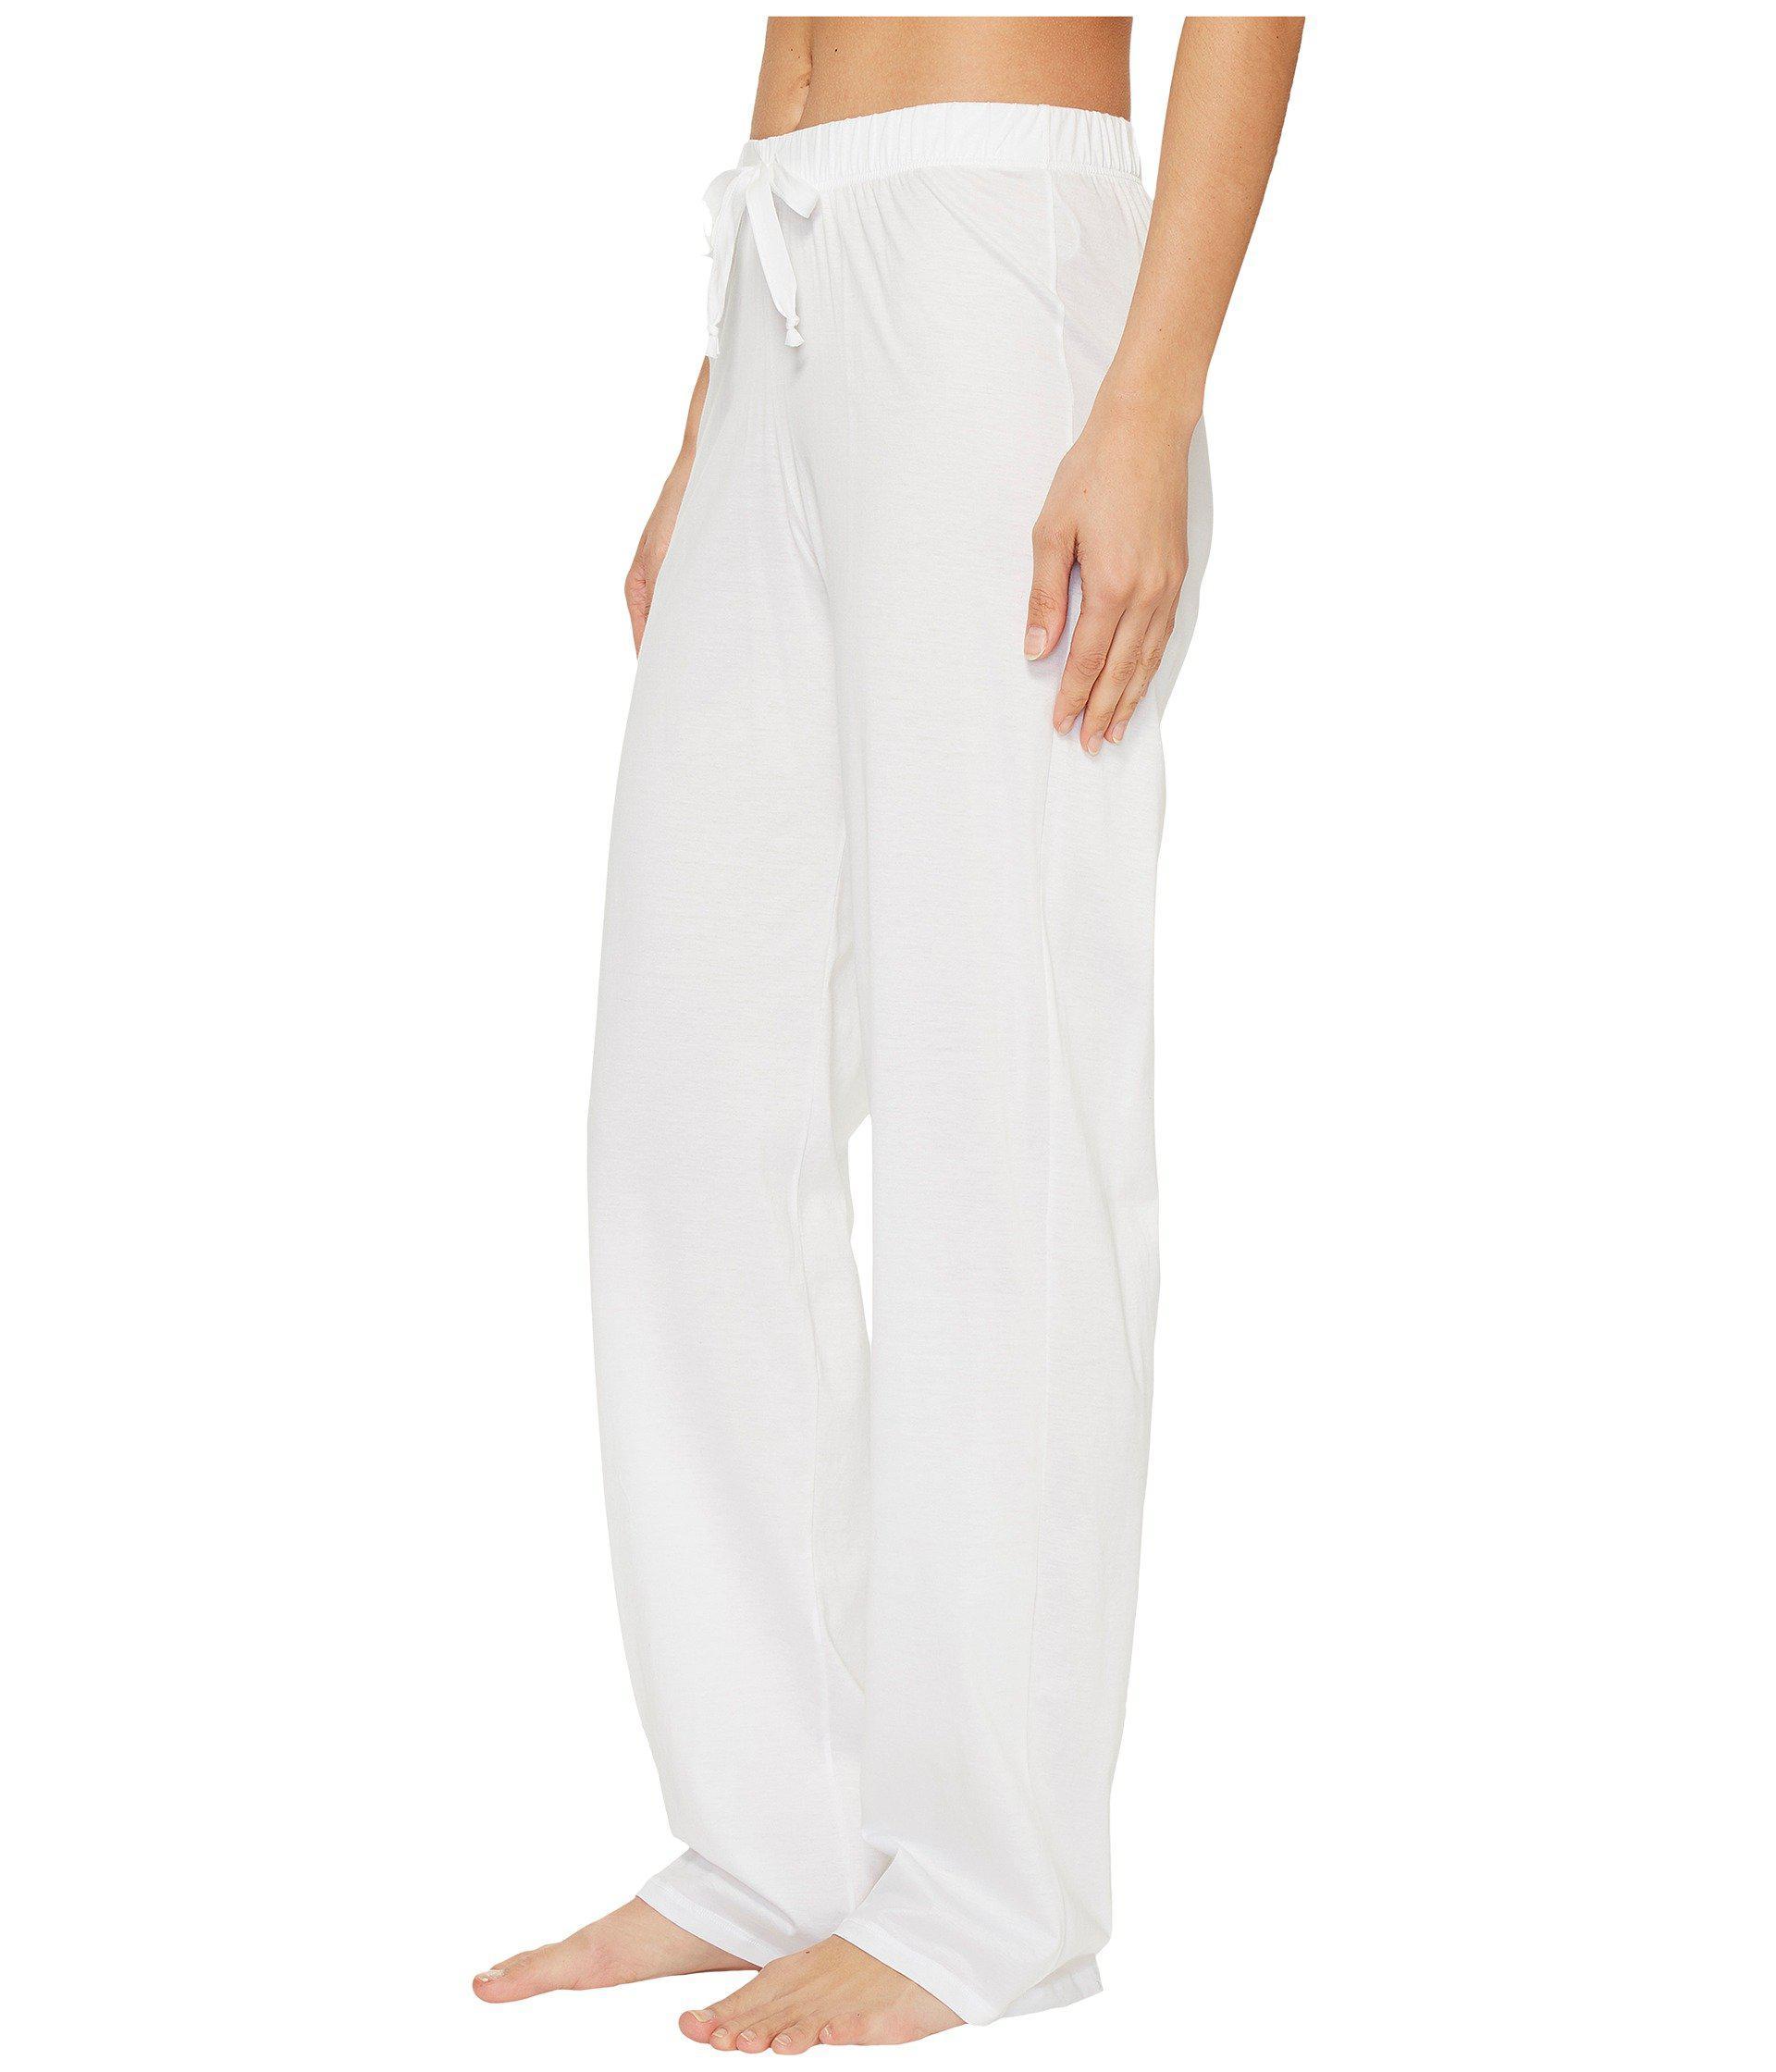 Hanro new Short leg pants in 100/% white cotton